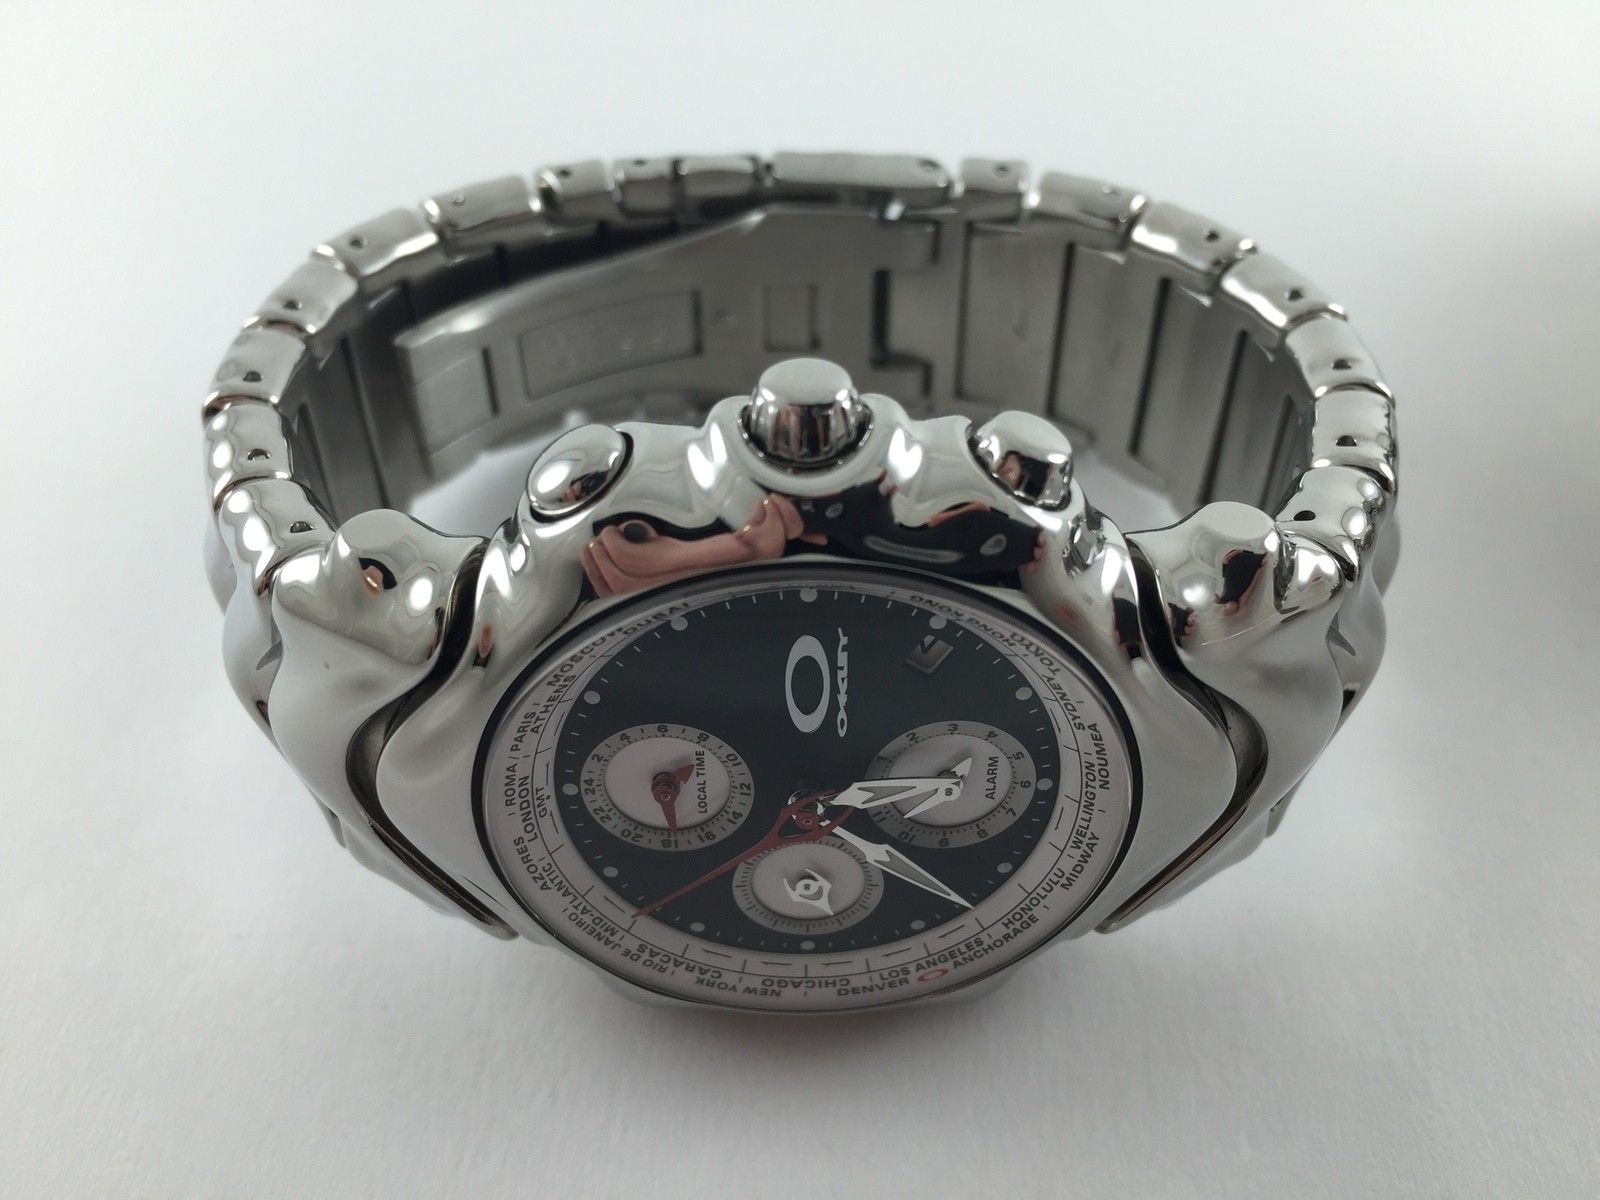 Hollow Point & GMT Watch - 15092915624_8353f845e5_o.jpg